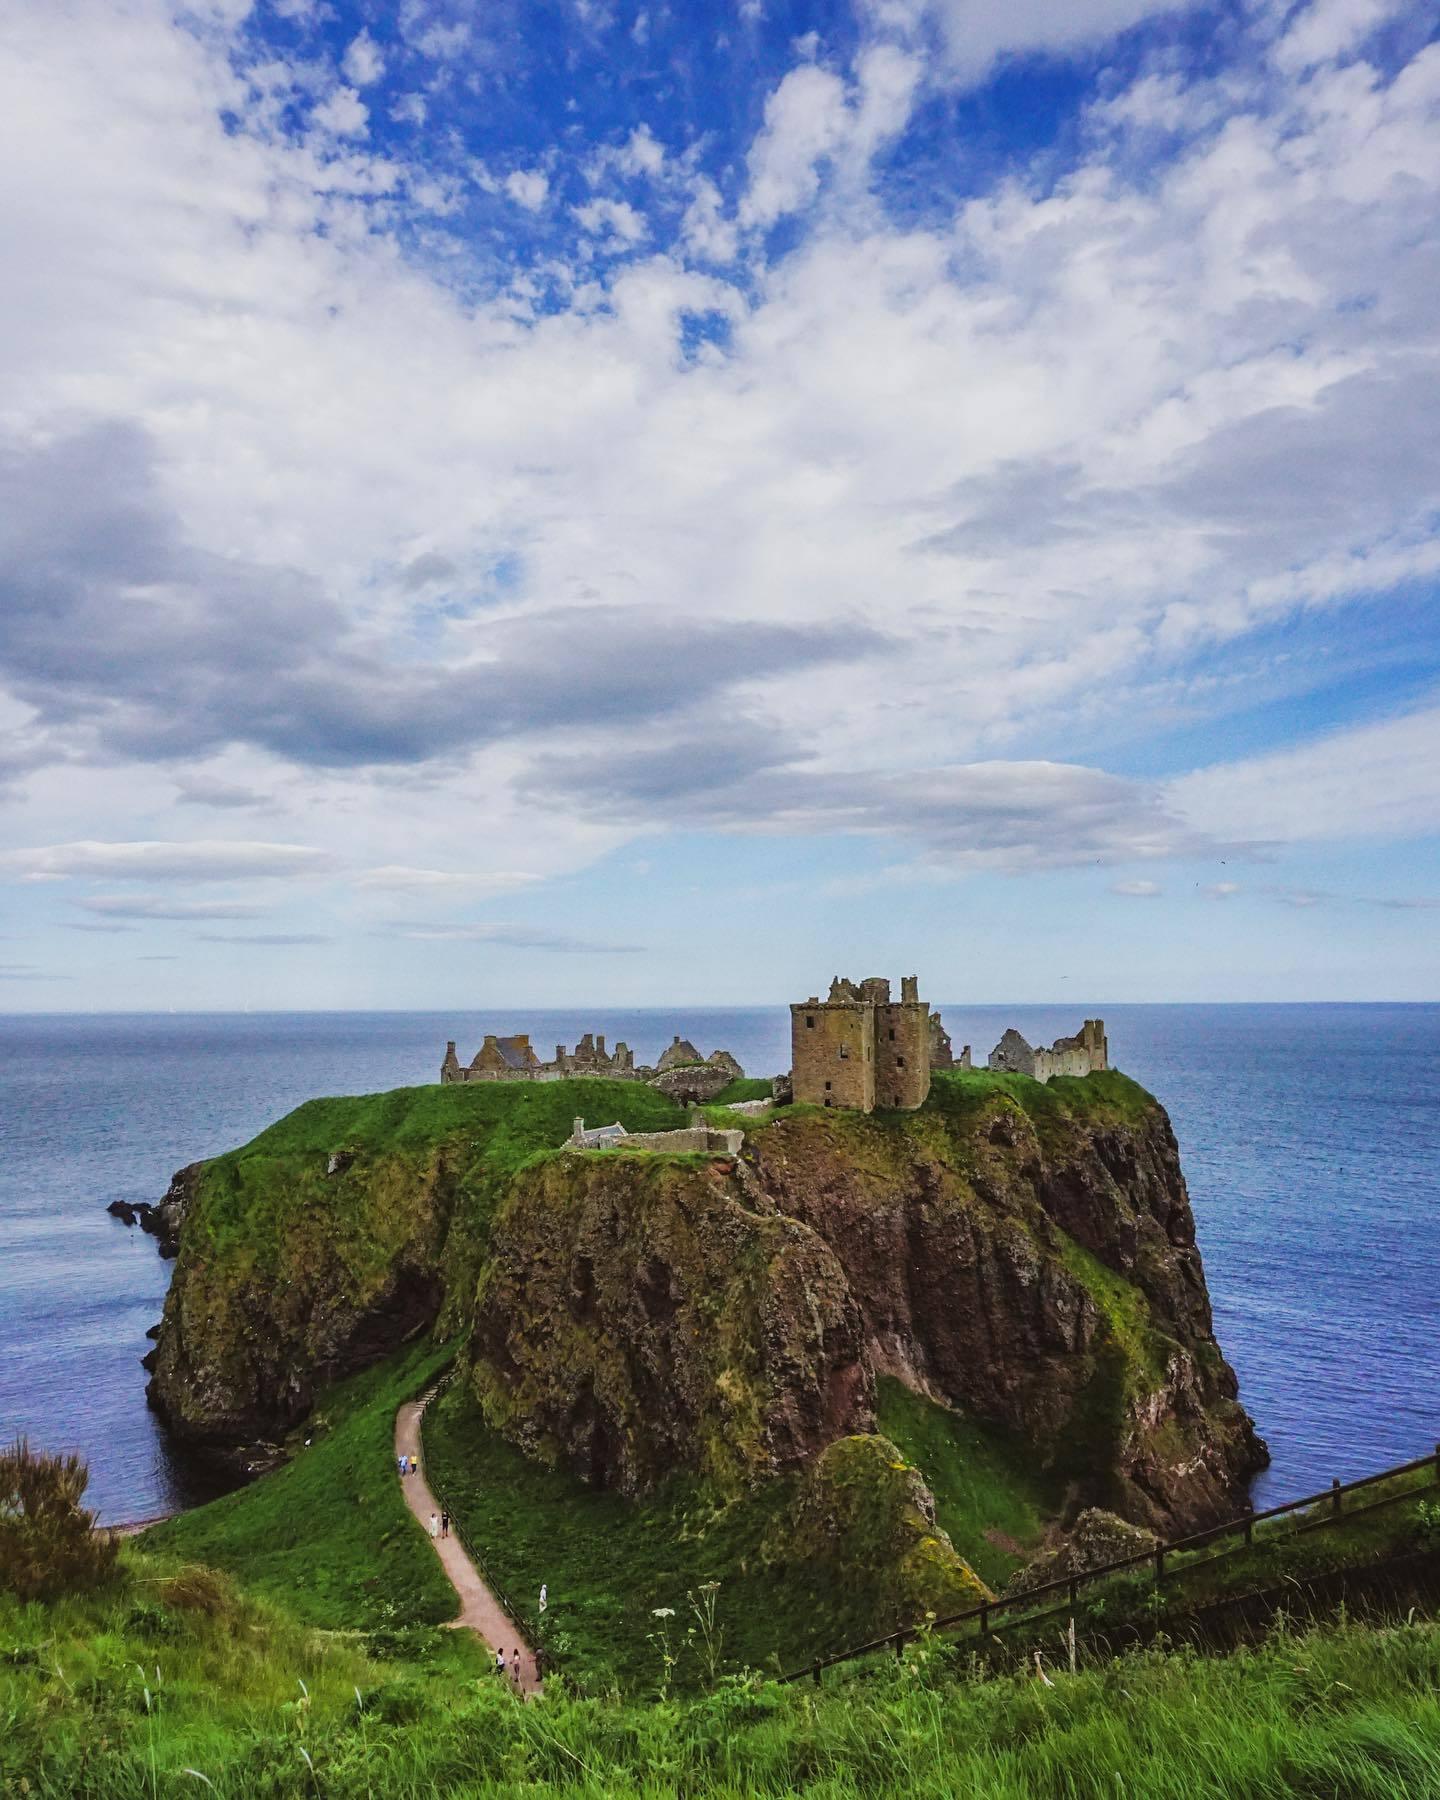 Dunnottar Castle is